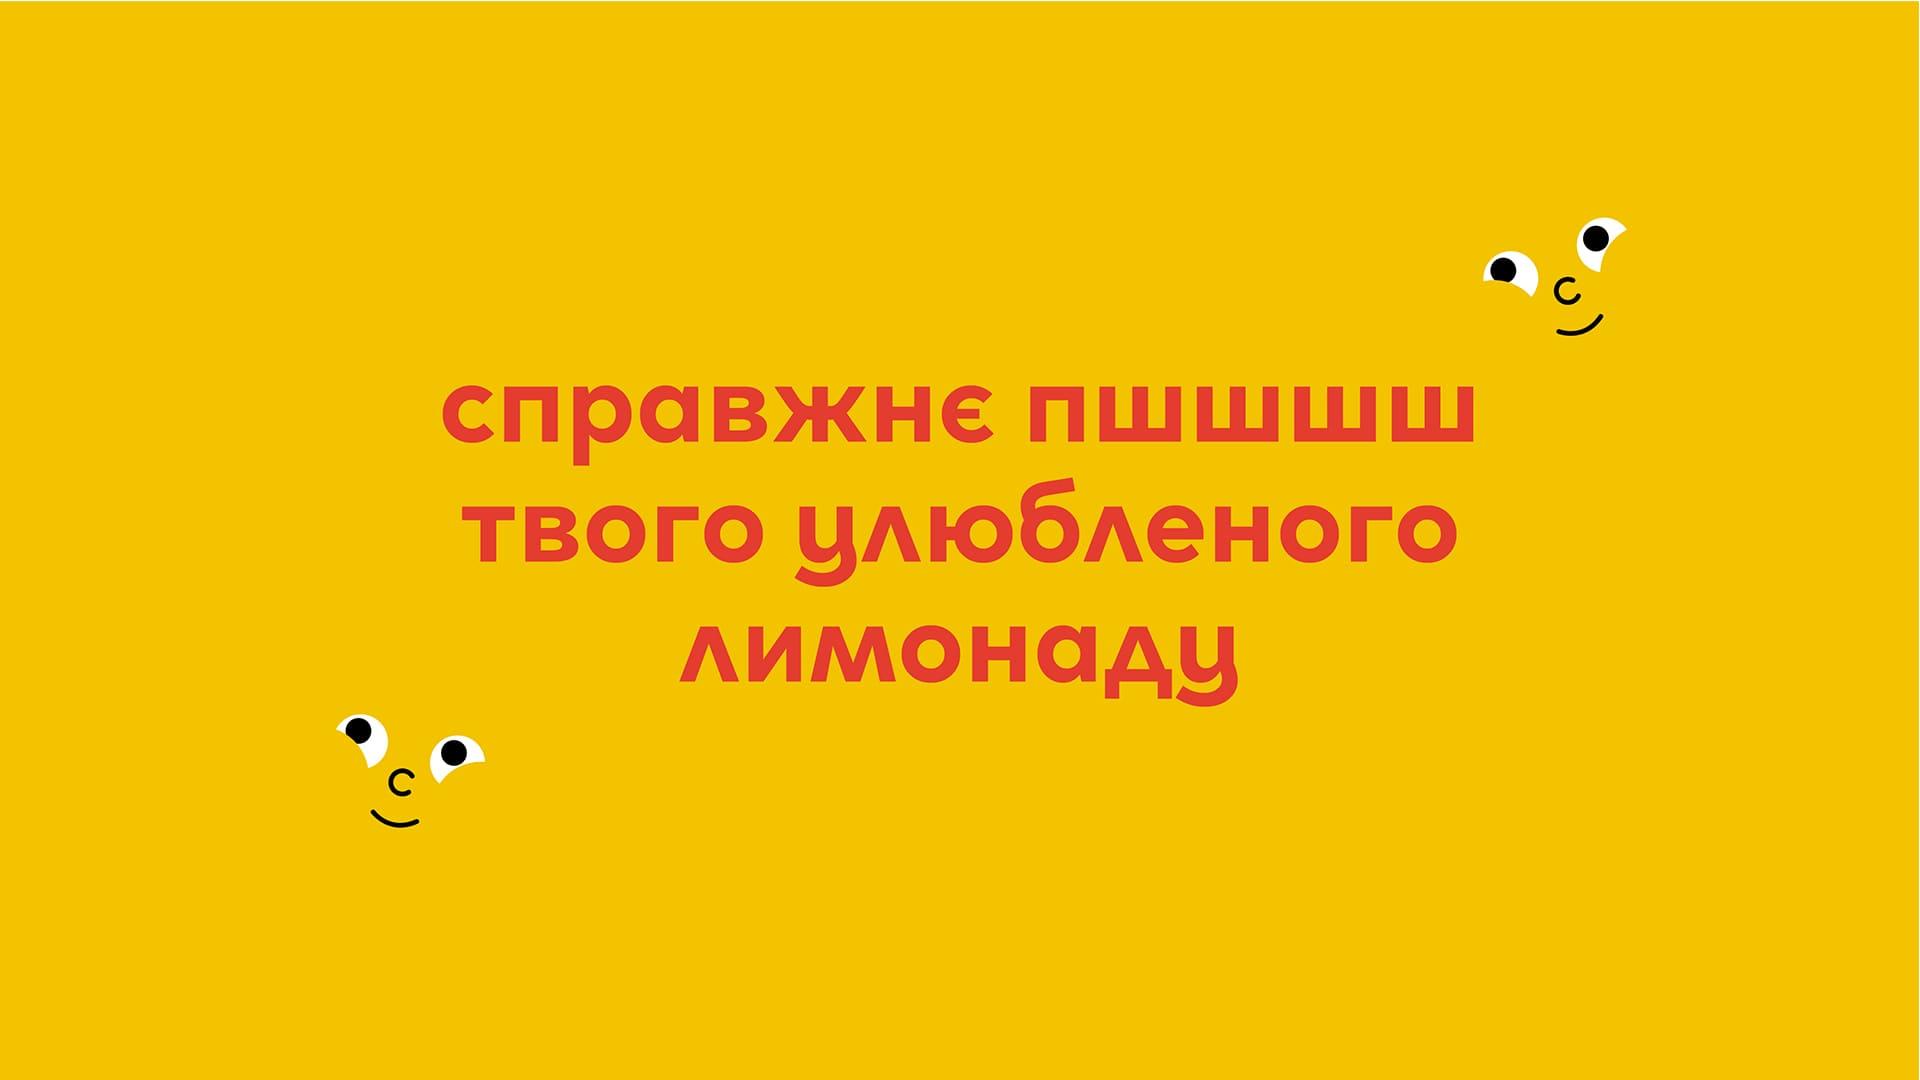 gra brand design umanpivo lemonade 3